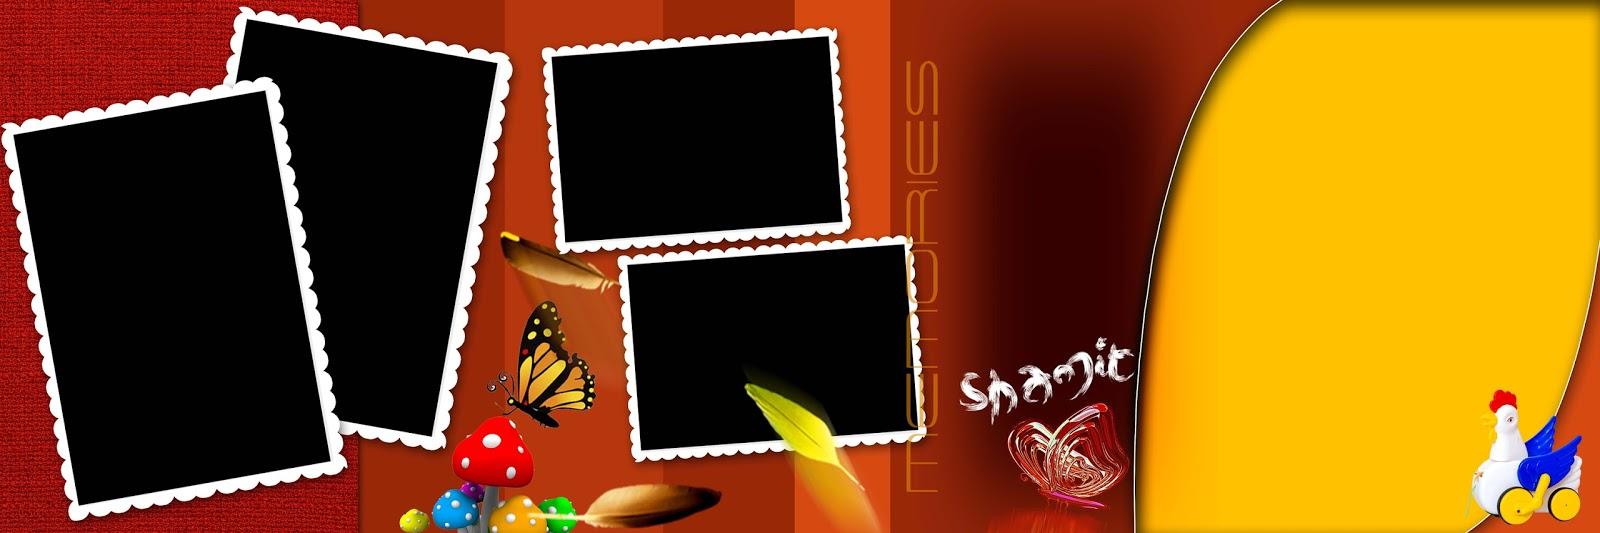 Download Birthday background designs for photoshop